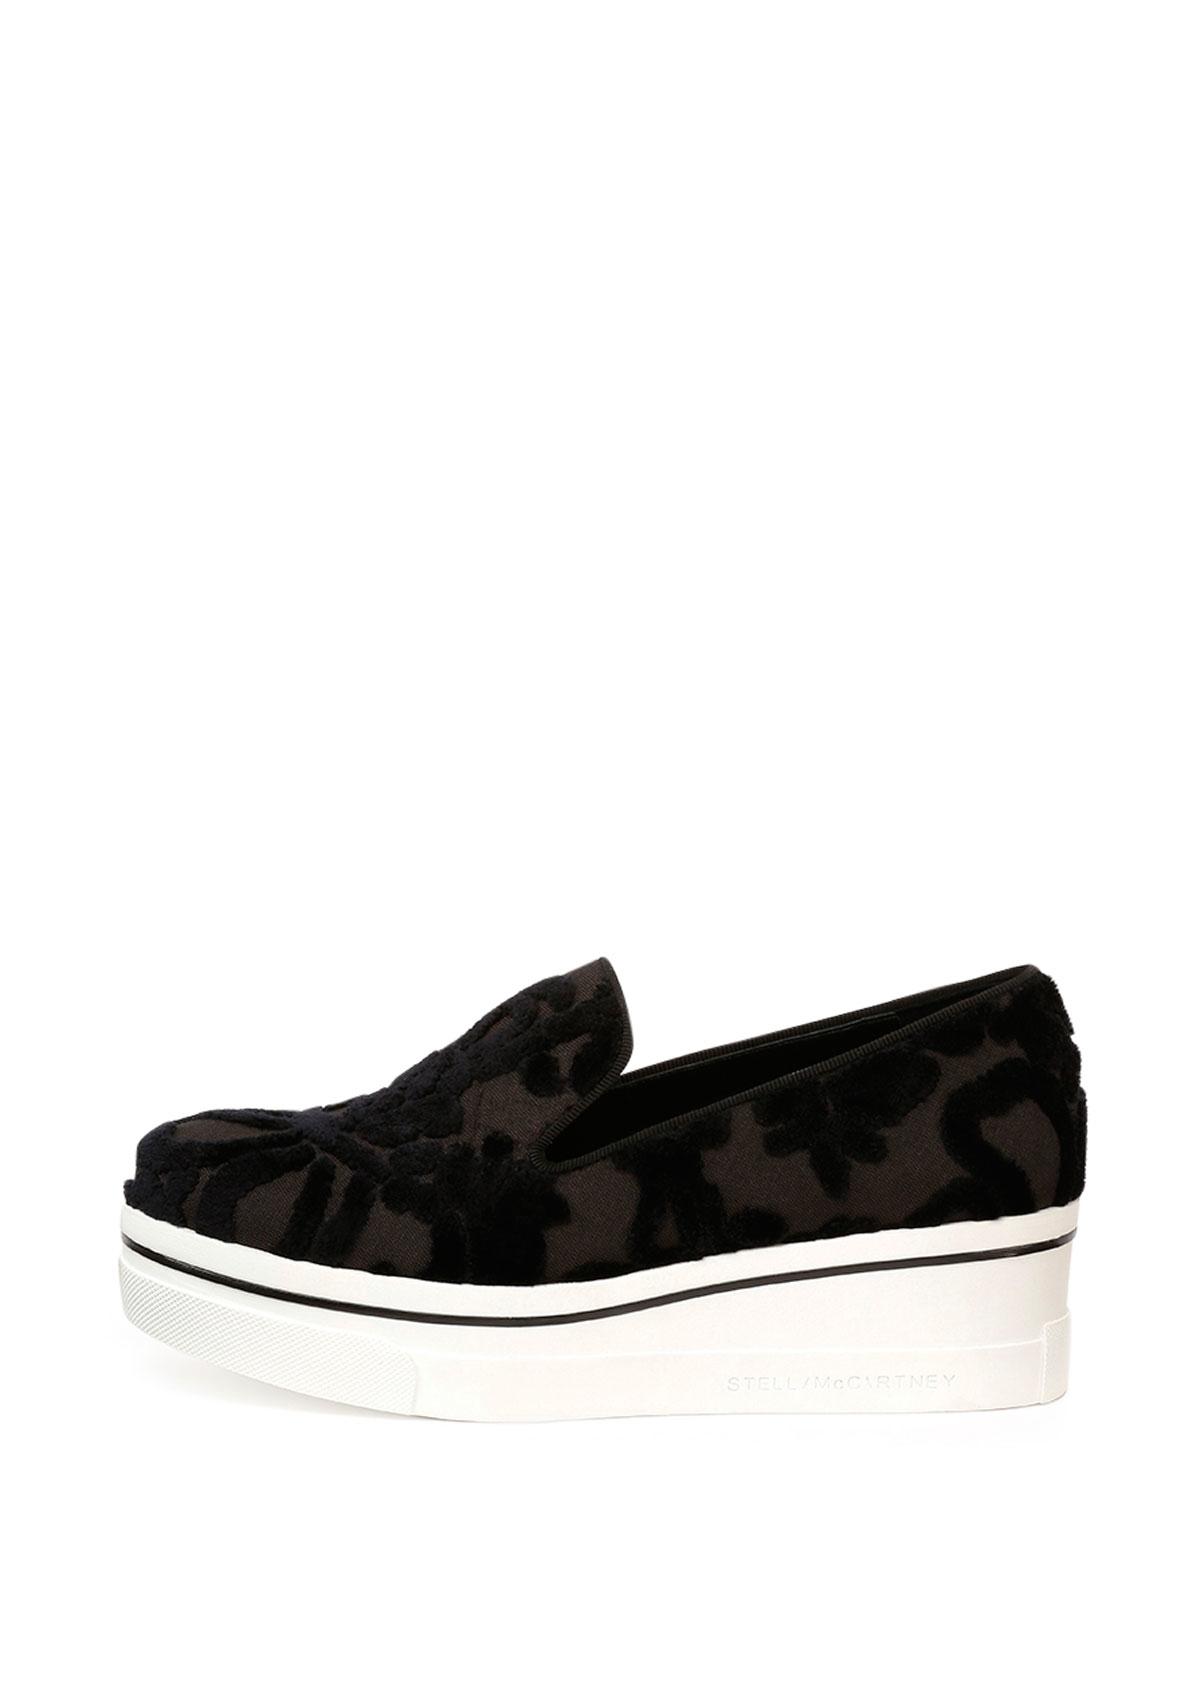 Stella McCartney Croc Binx Slip-On Sneakers J8pwcdsCPP